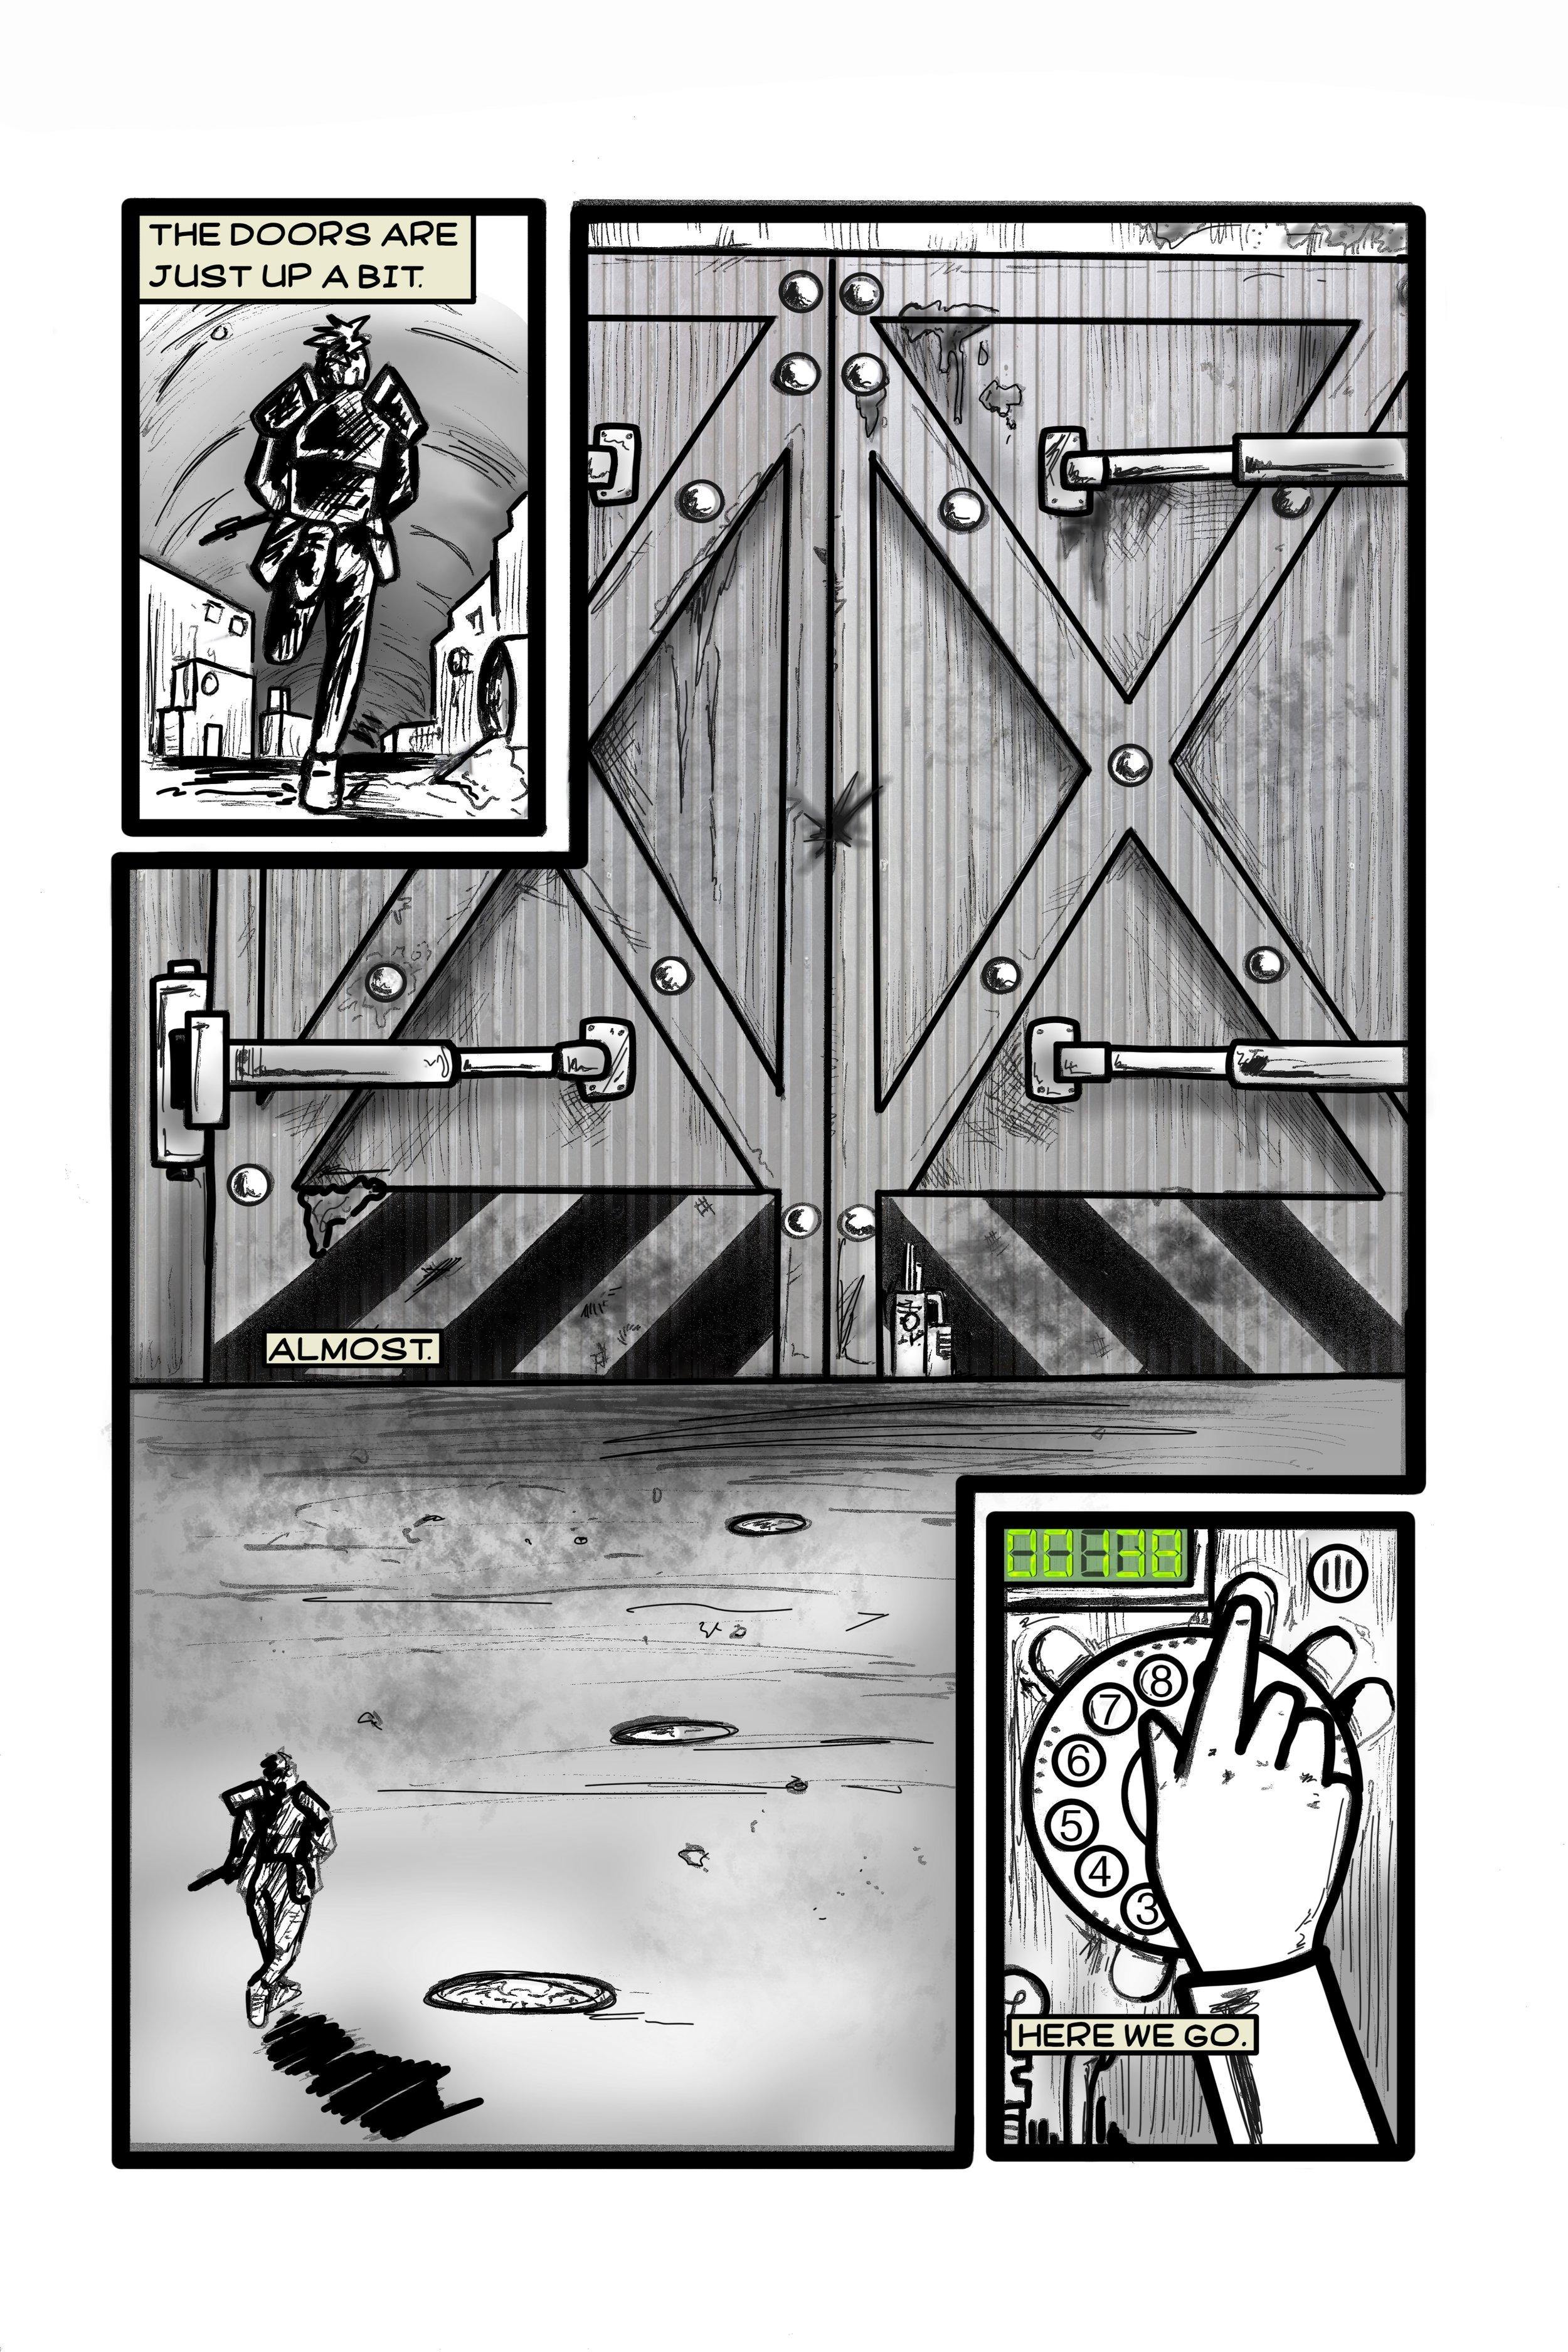 twh page15.jpg